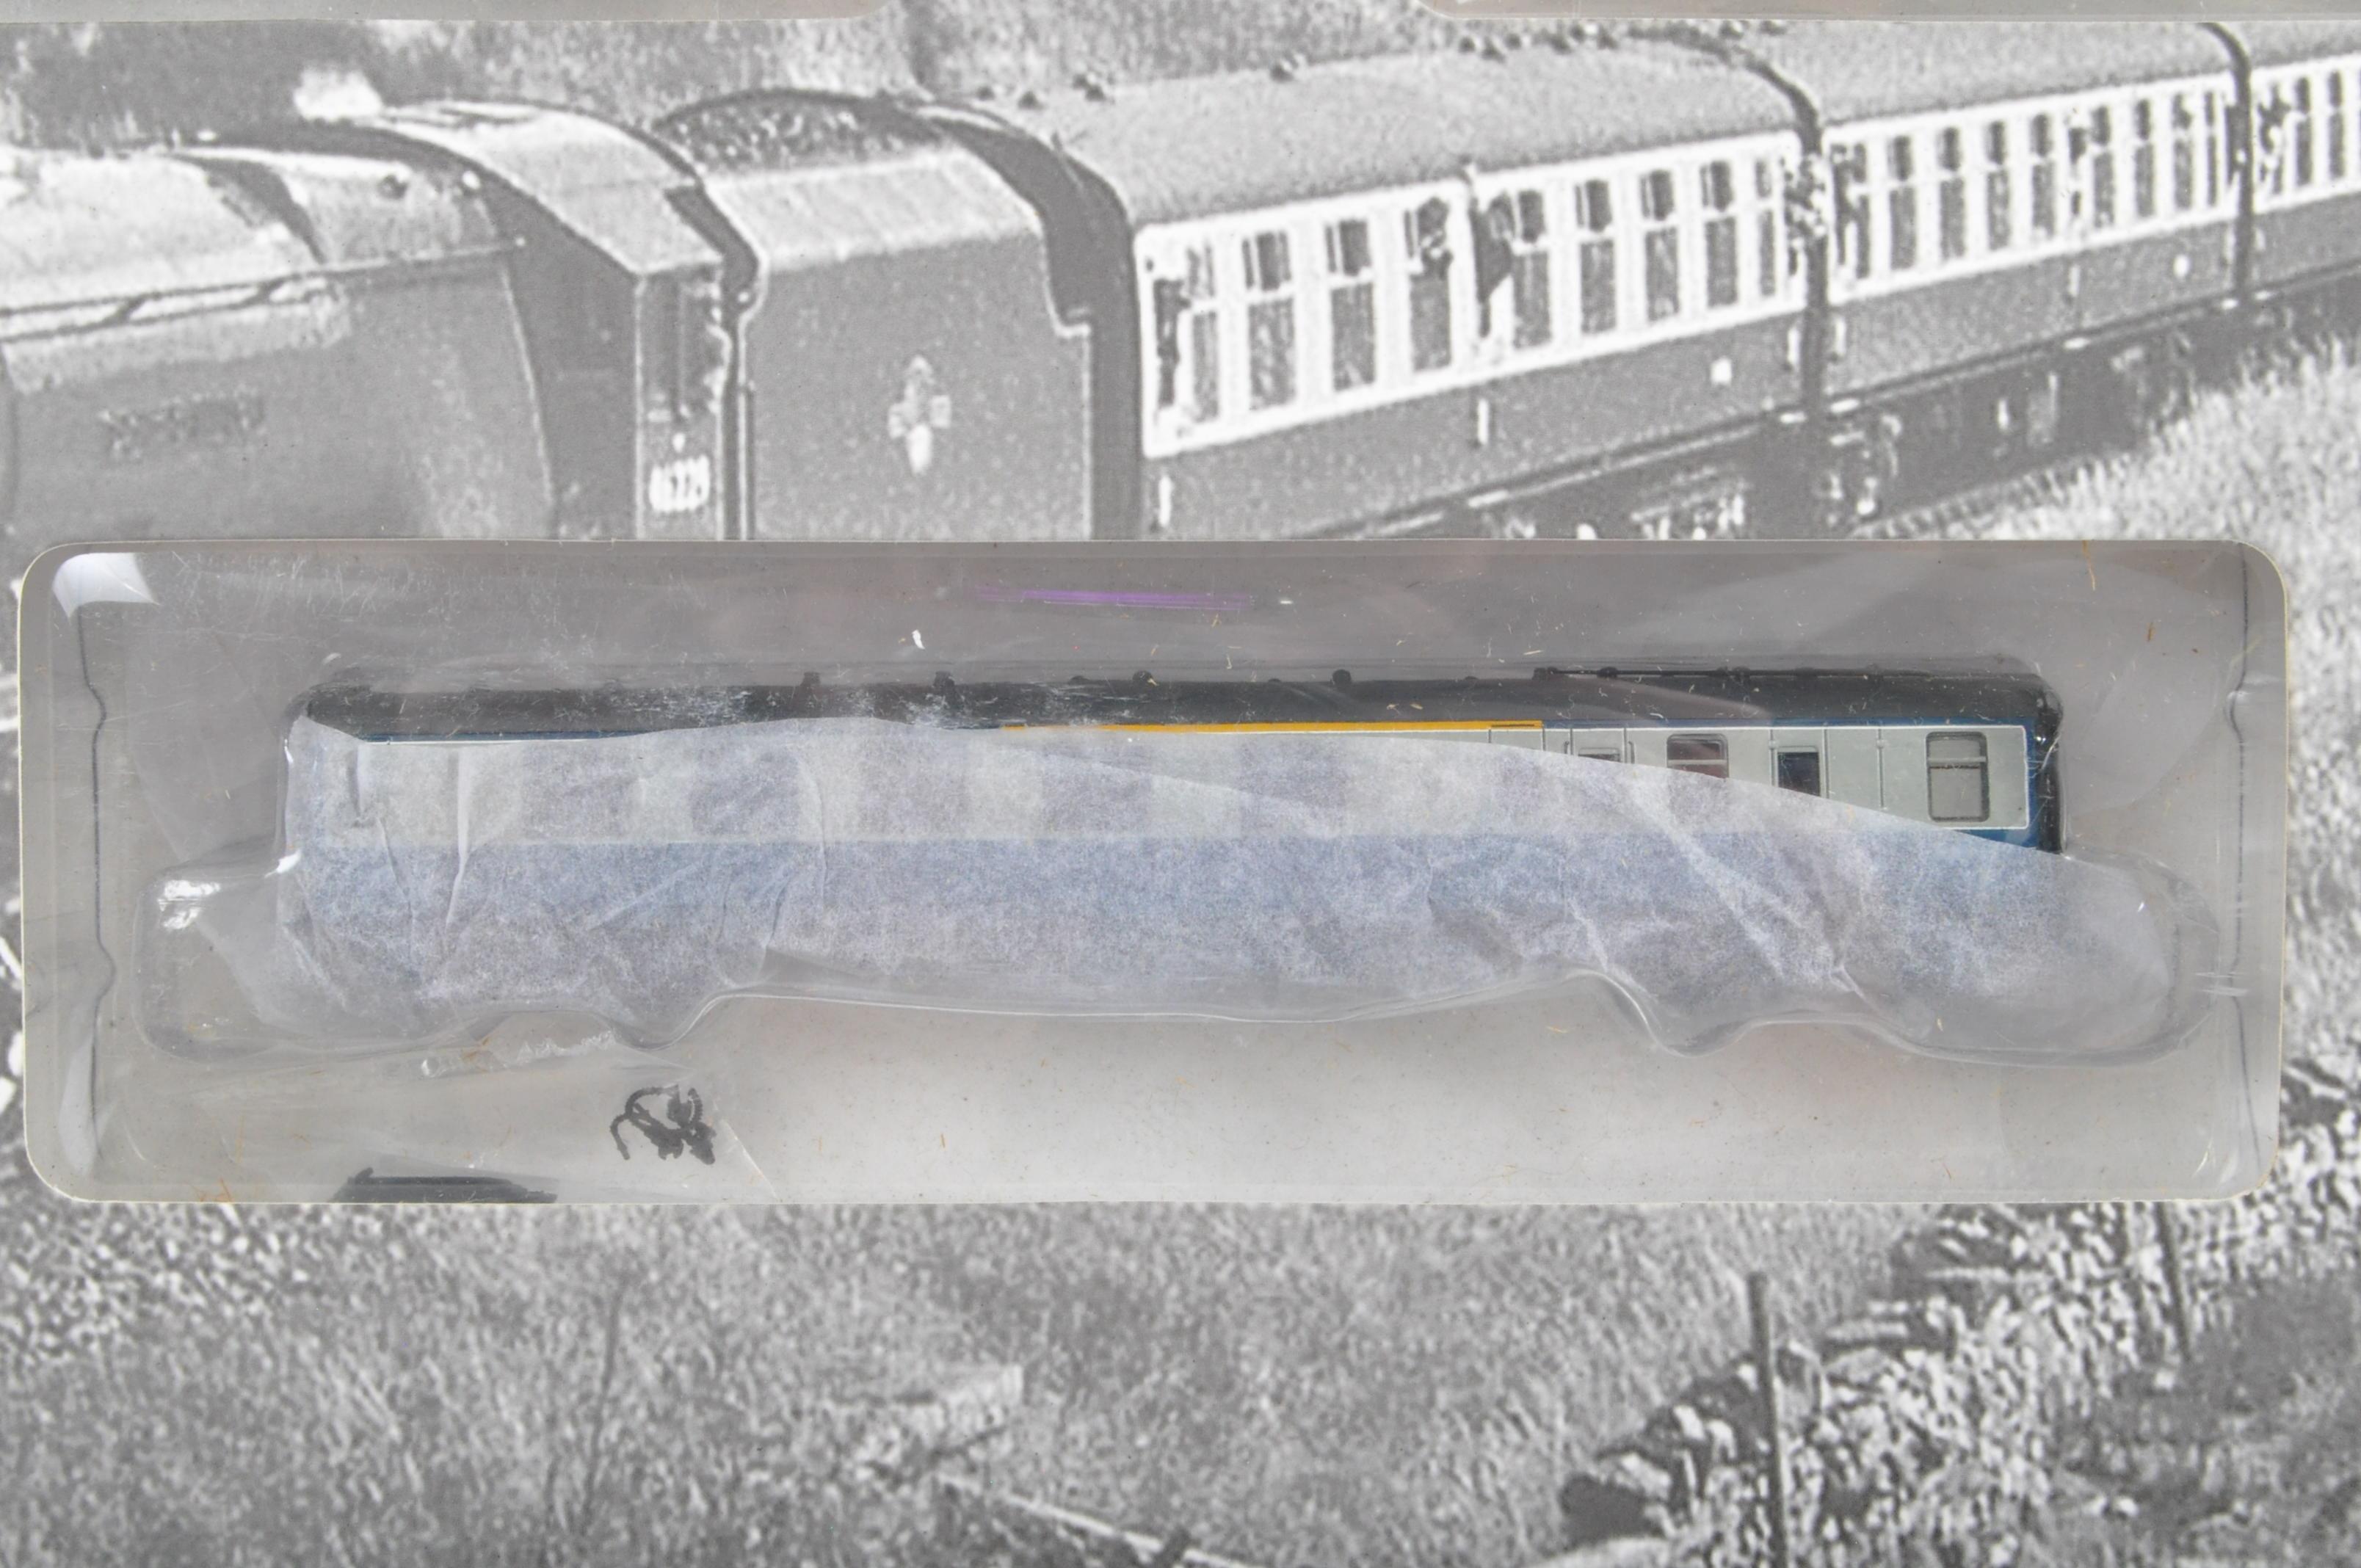 ORIGINAL BOXED GRAHAM FARISH CUMBRIAN MOUNTAIN EXPRESS TRAINSET - Image 7 of 9